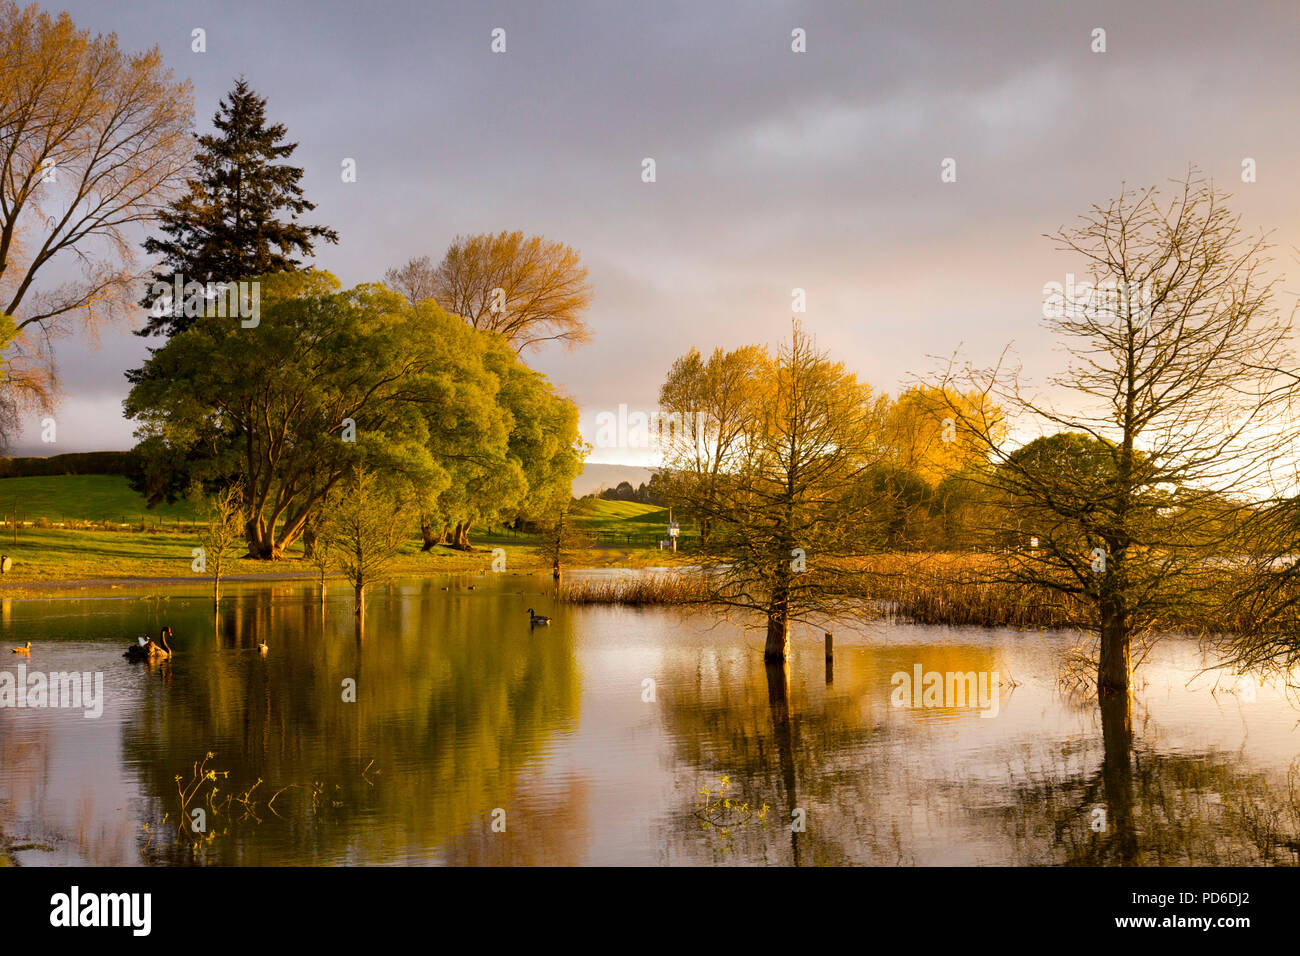 Guy Roe Reserva, Lago Rerewhakaaitu, Rotorua, Nueva Zelanda, en la hermosa luz temprano por la mañana. Foto de stock